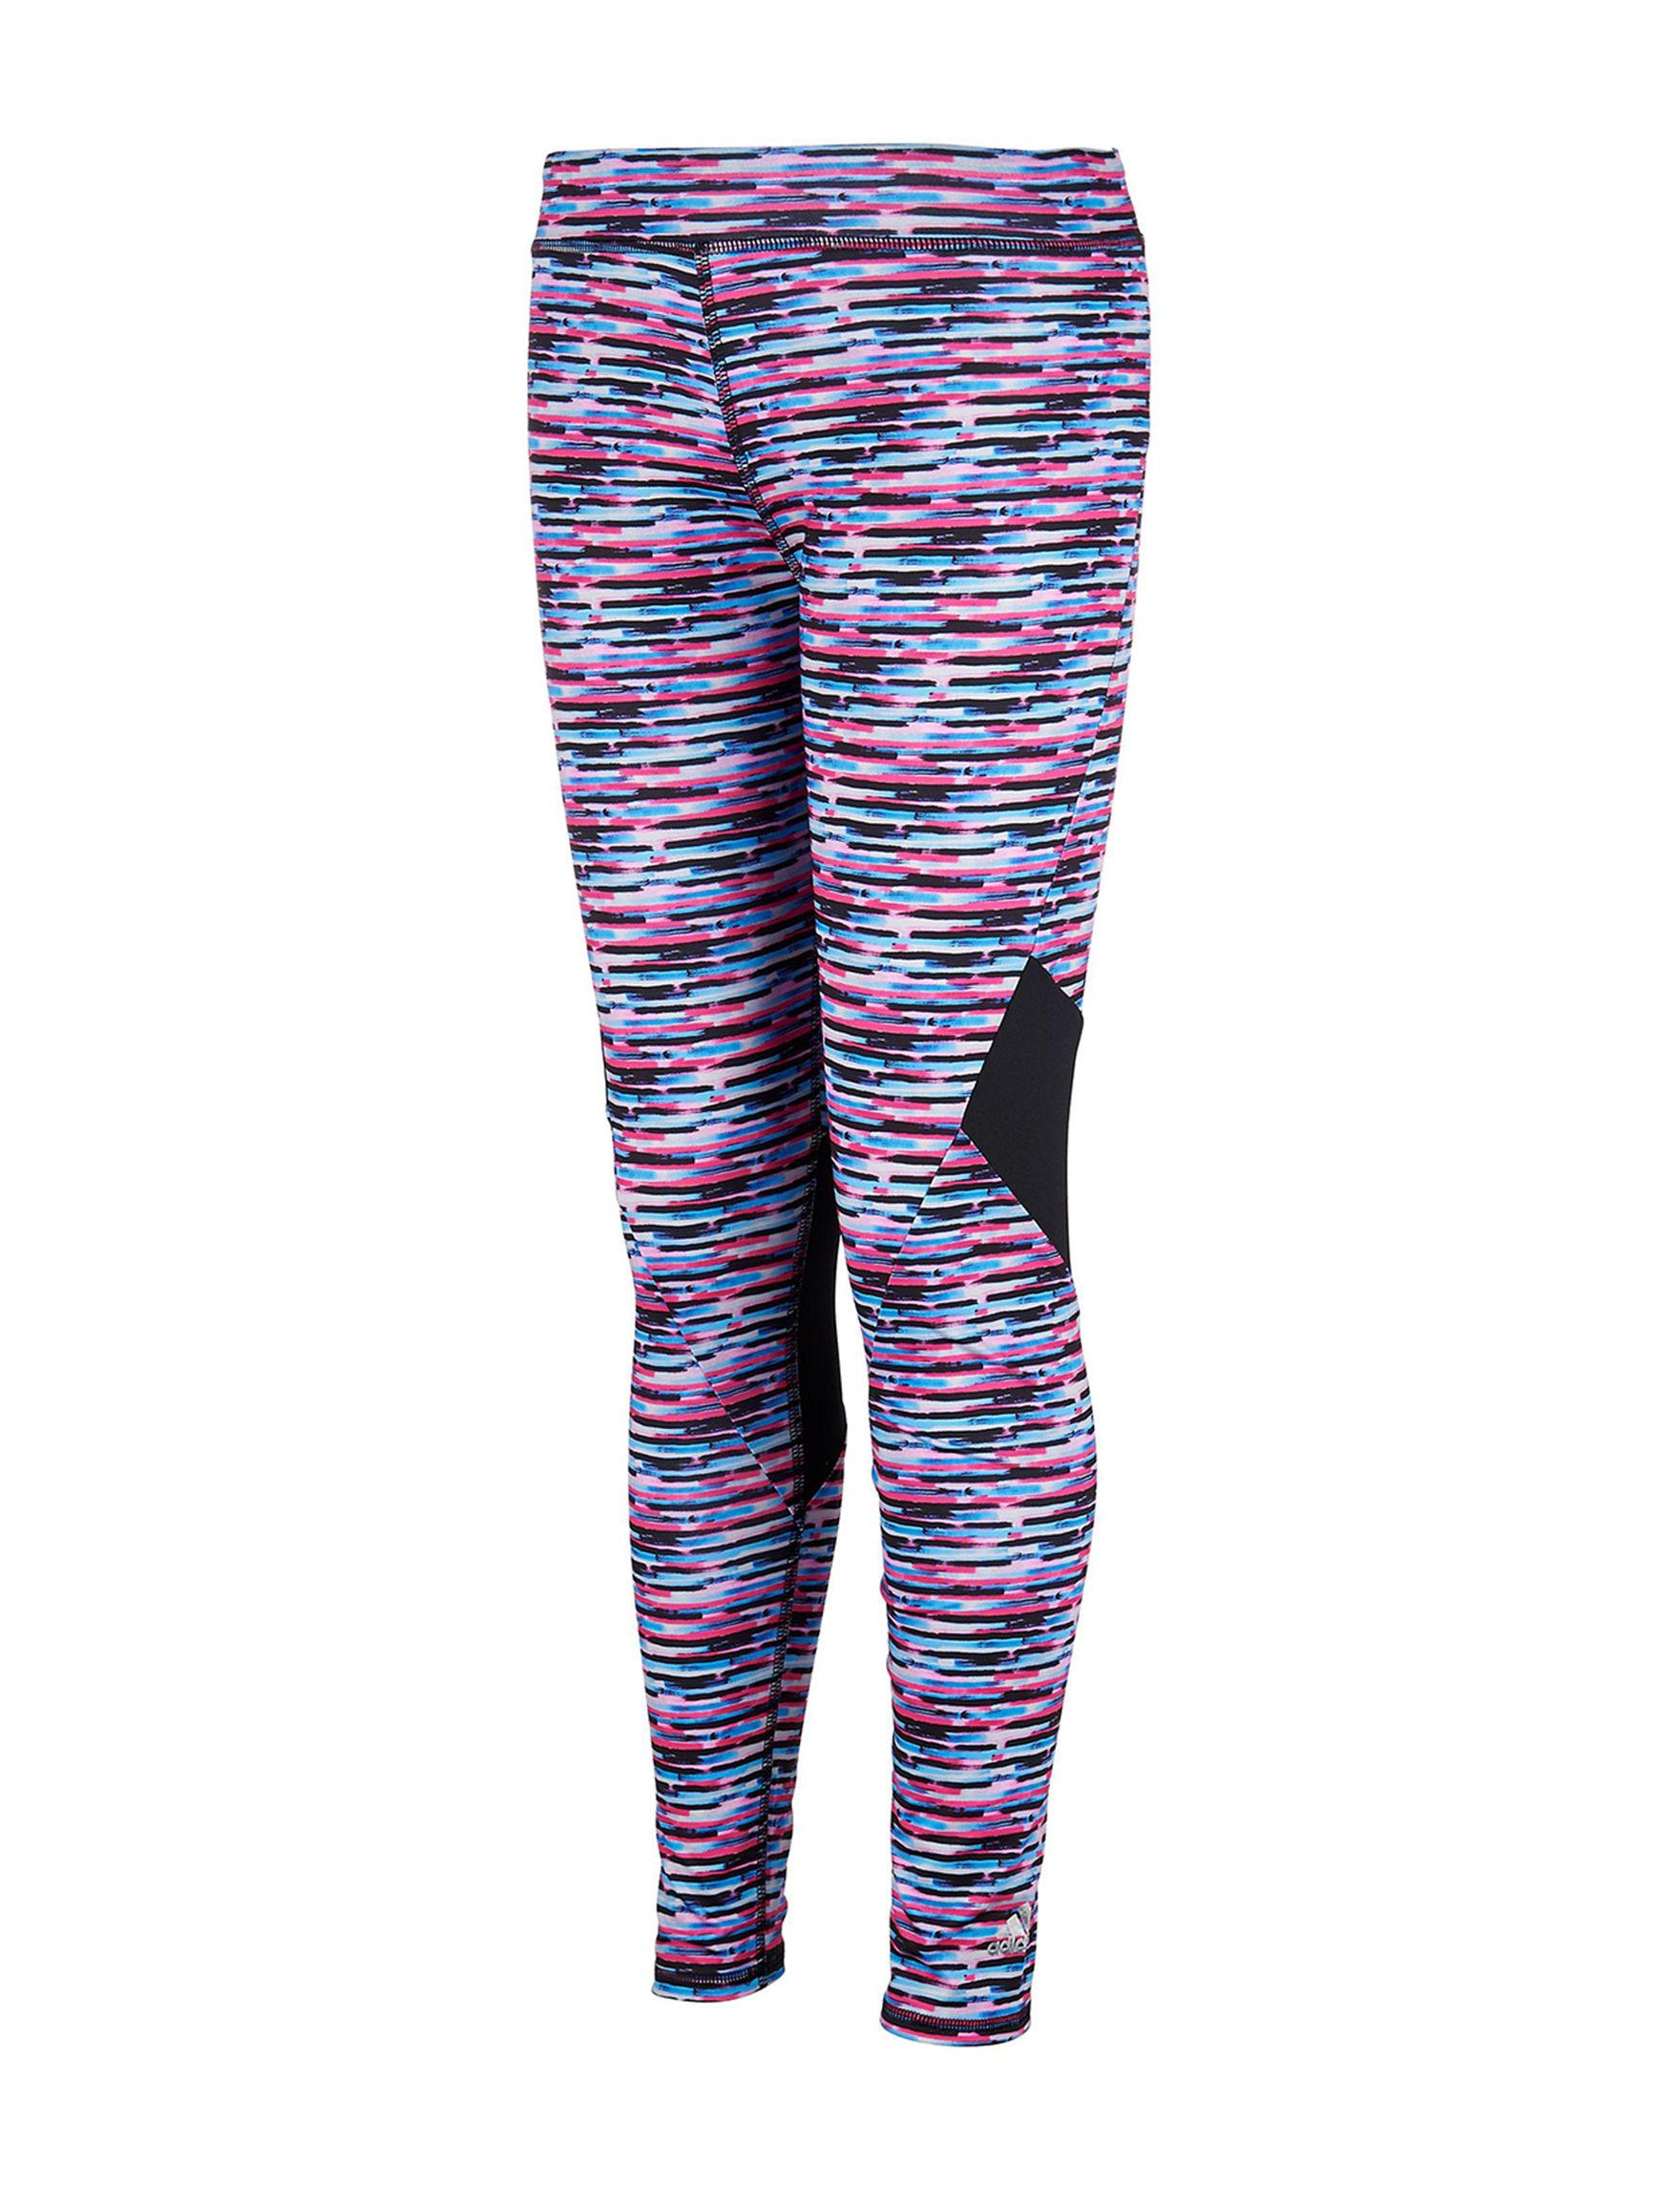 Adidas Pink Multi Leggings